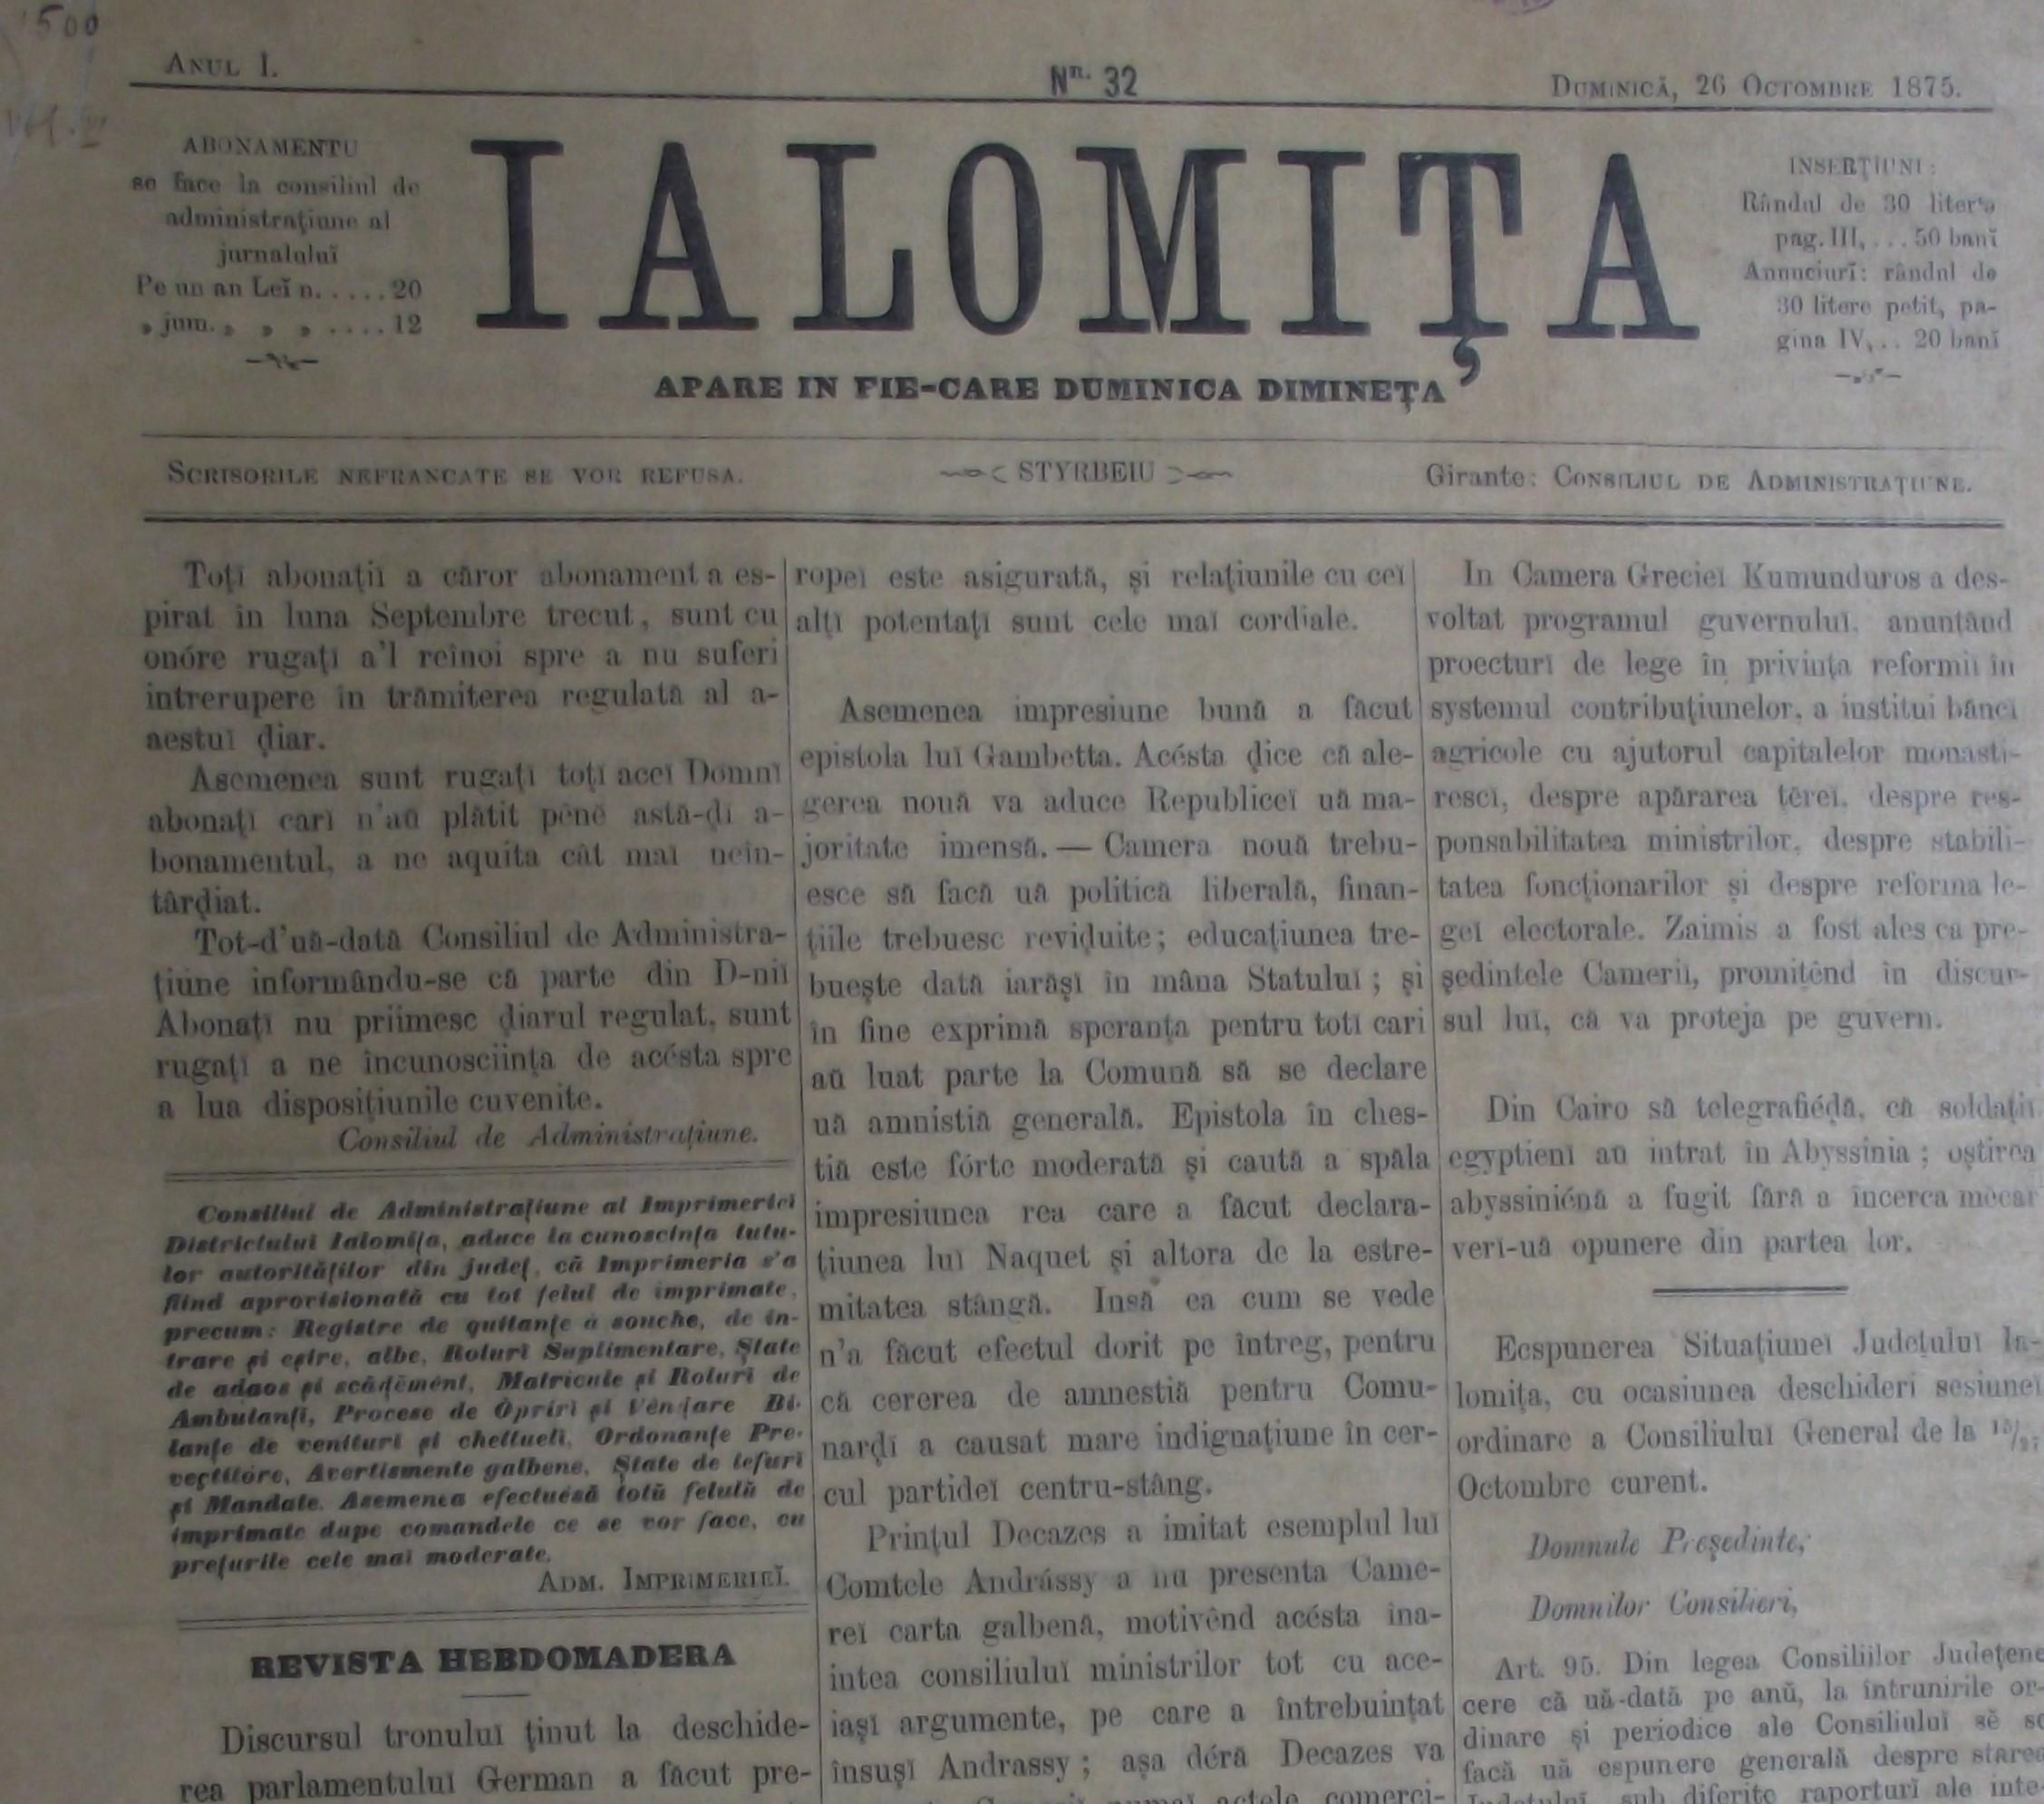 Ialomita